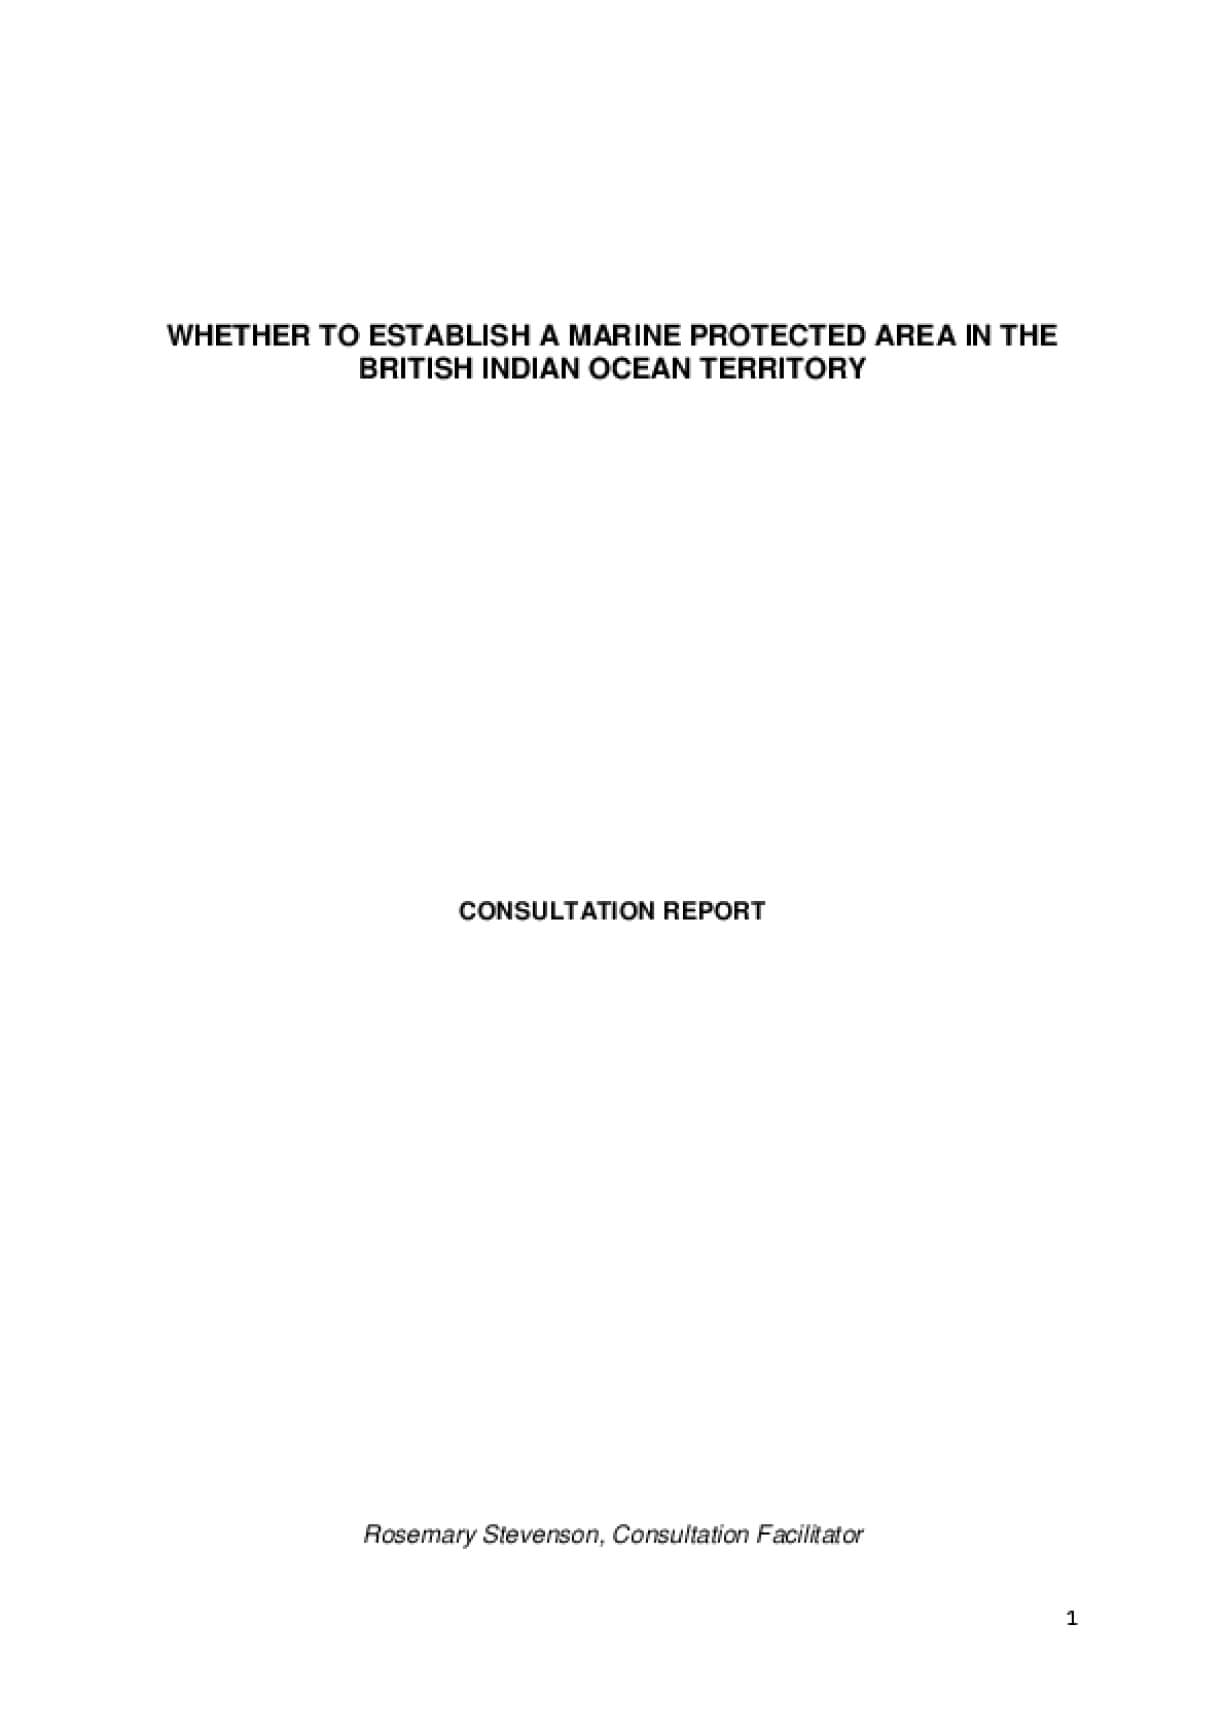 The Consultation Report